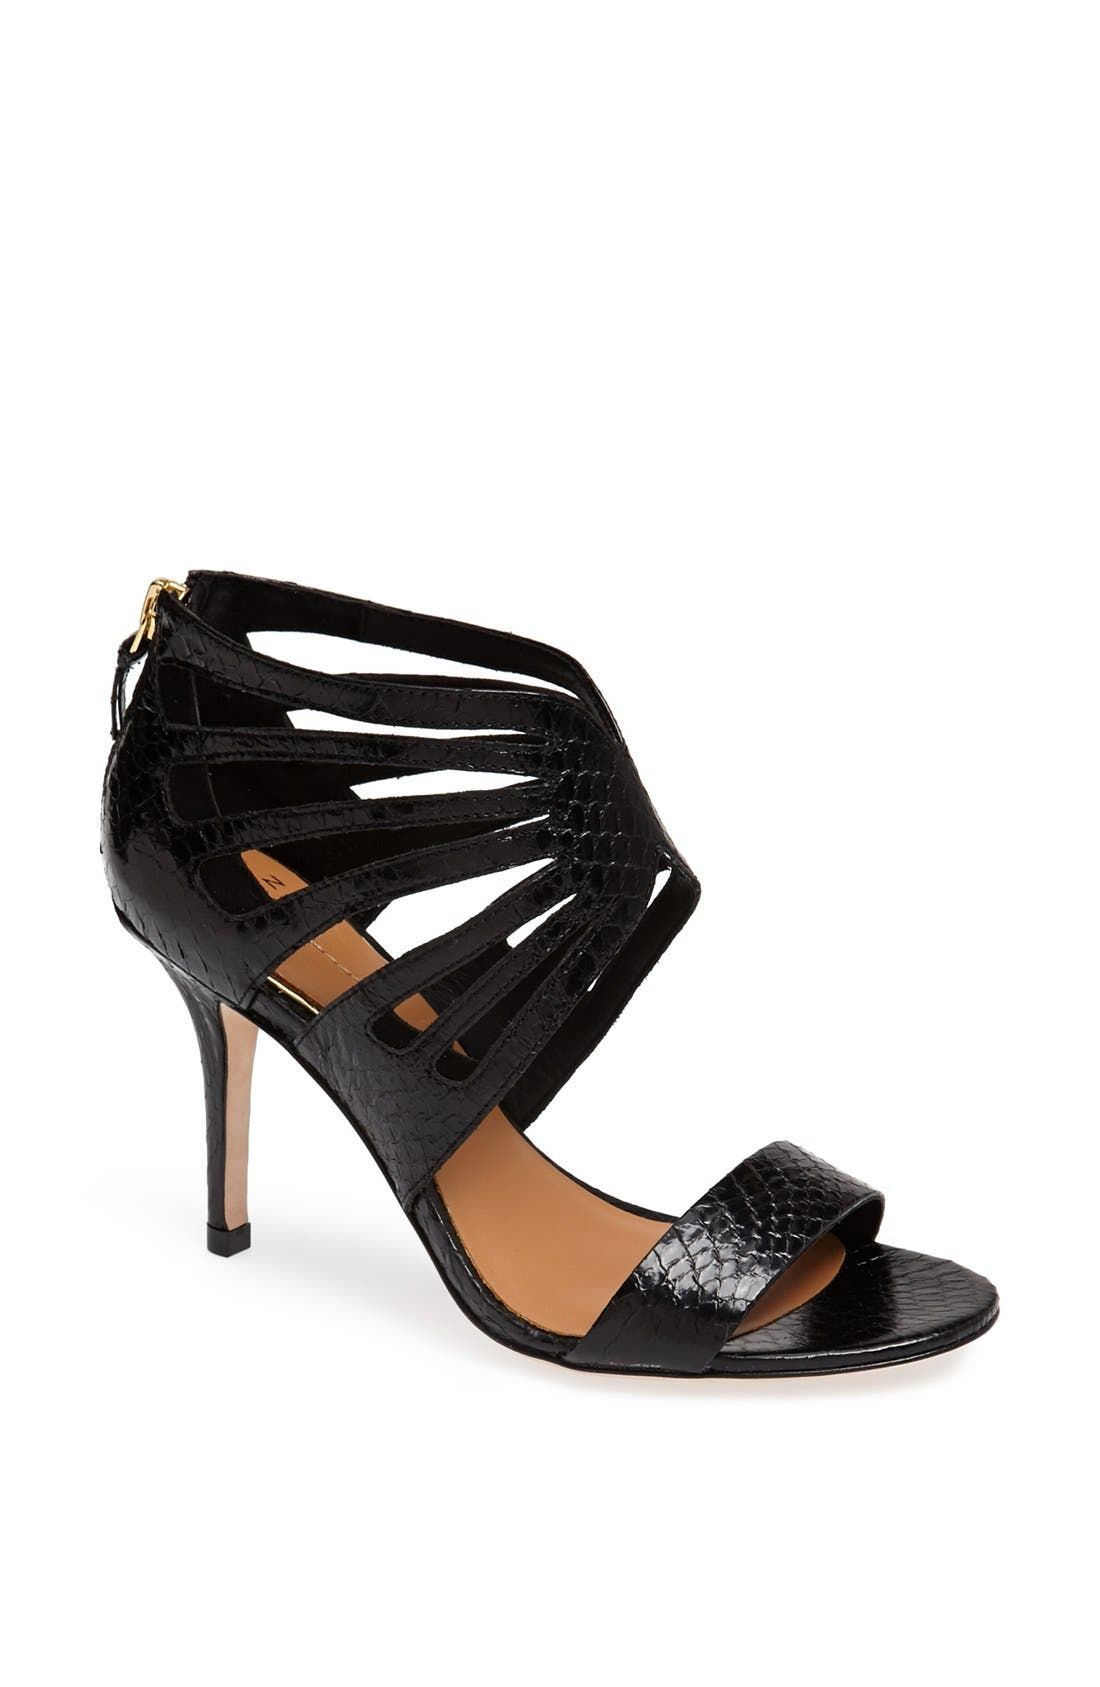 Alternate Image 1 Selected - Aerin 'Chiara' Genuine Snakeskin Sandal